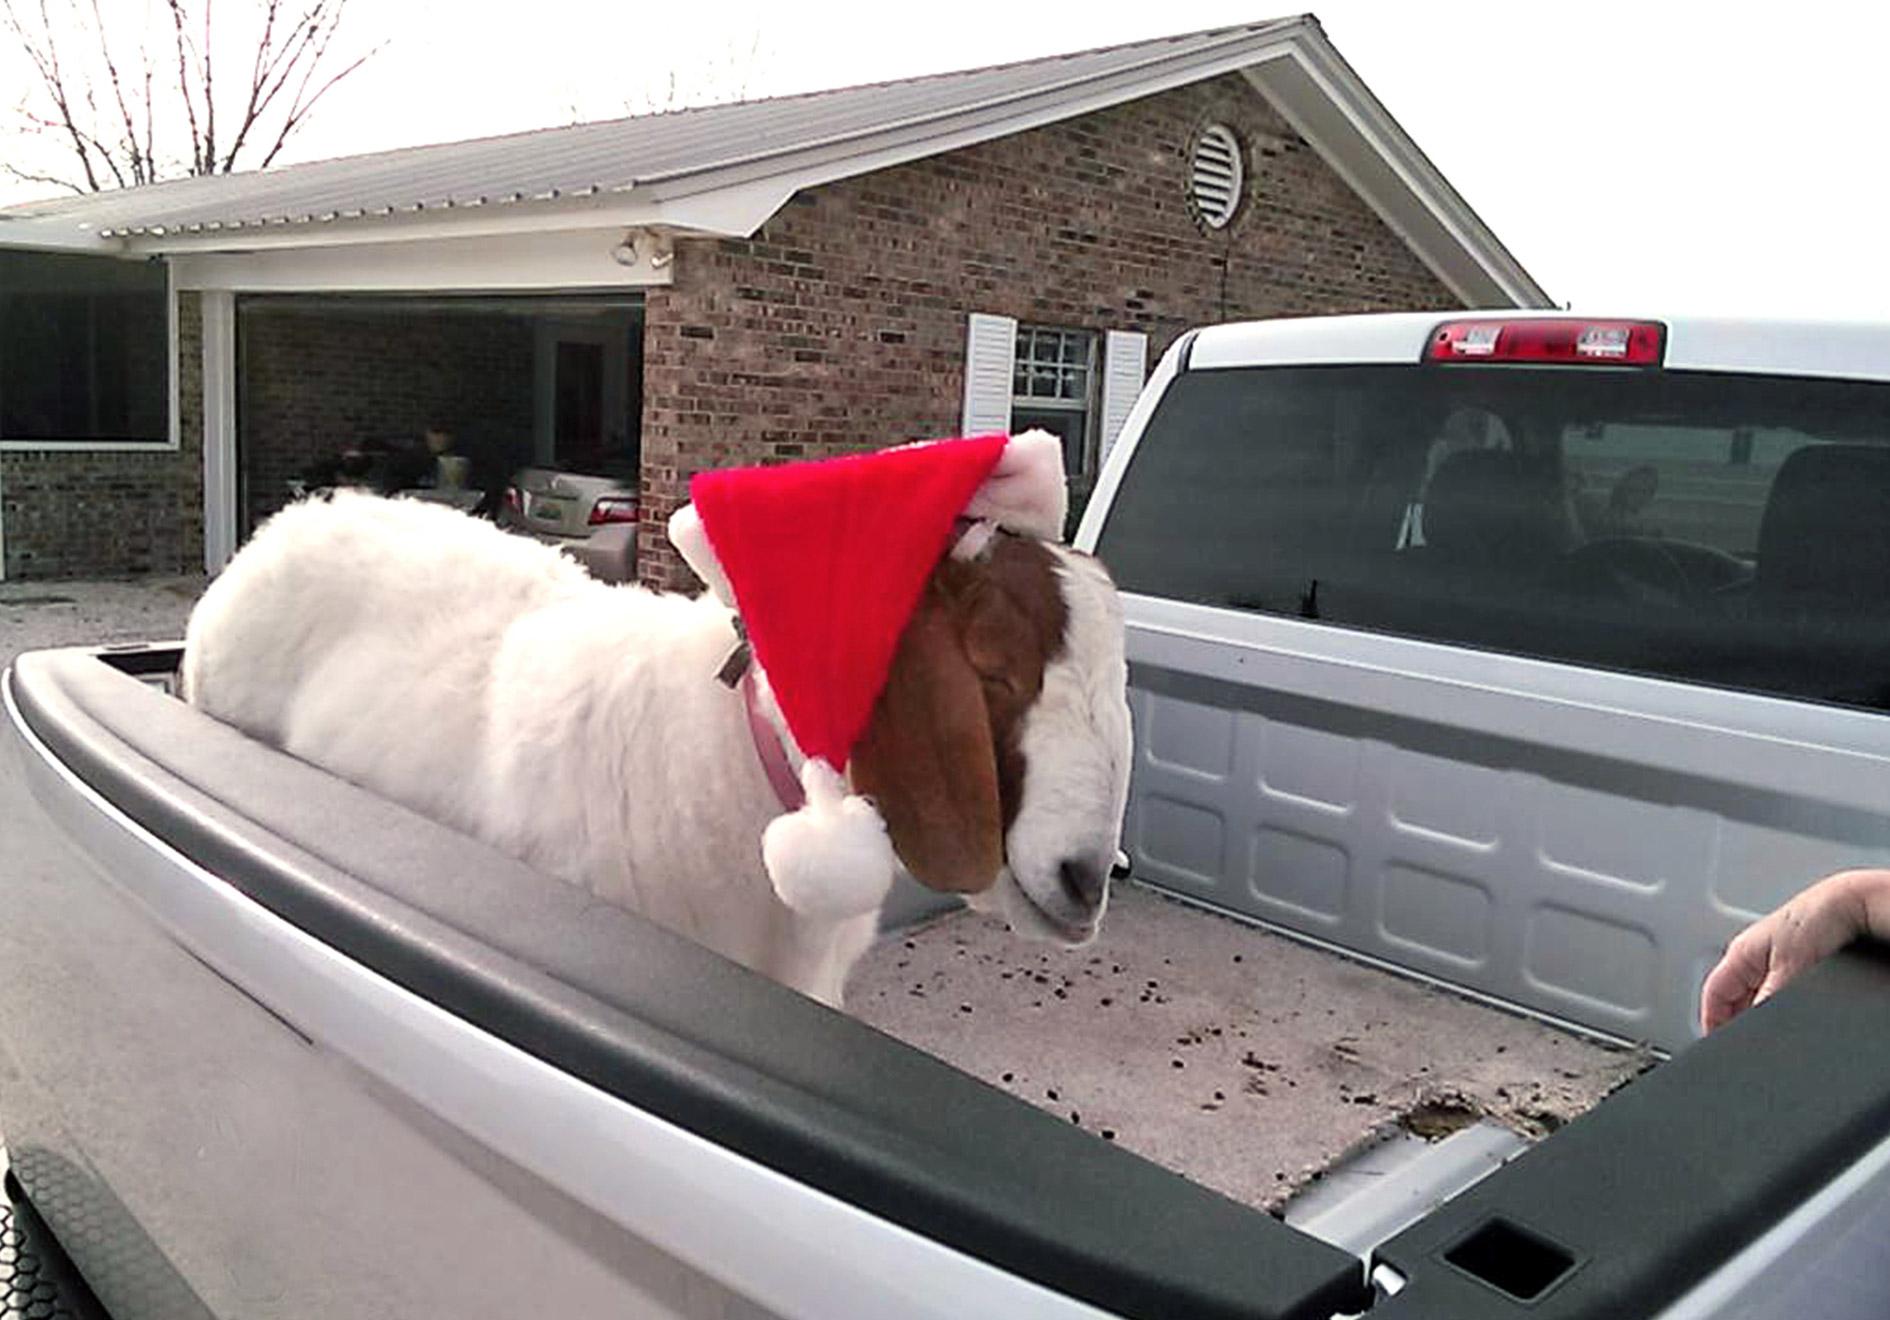 Goat in Truck